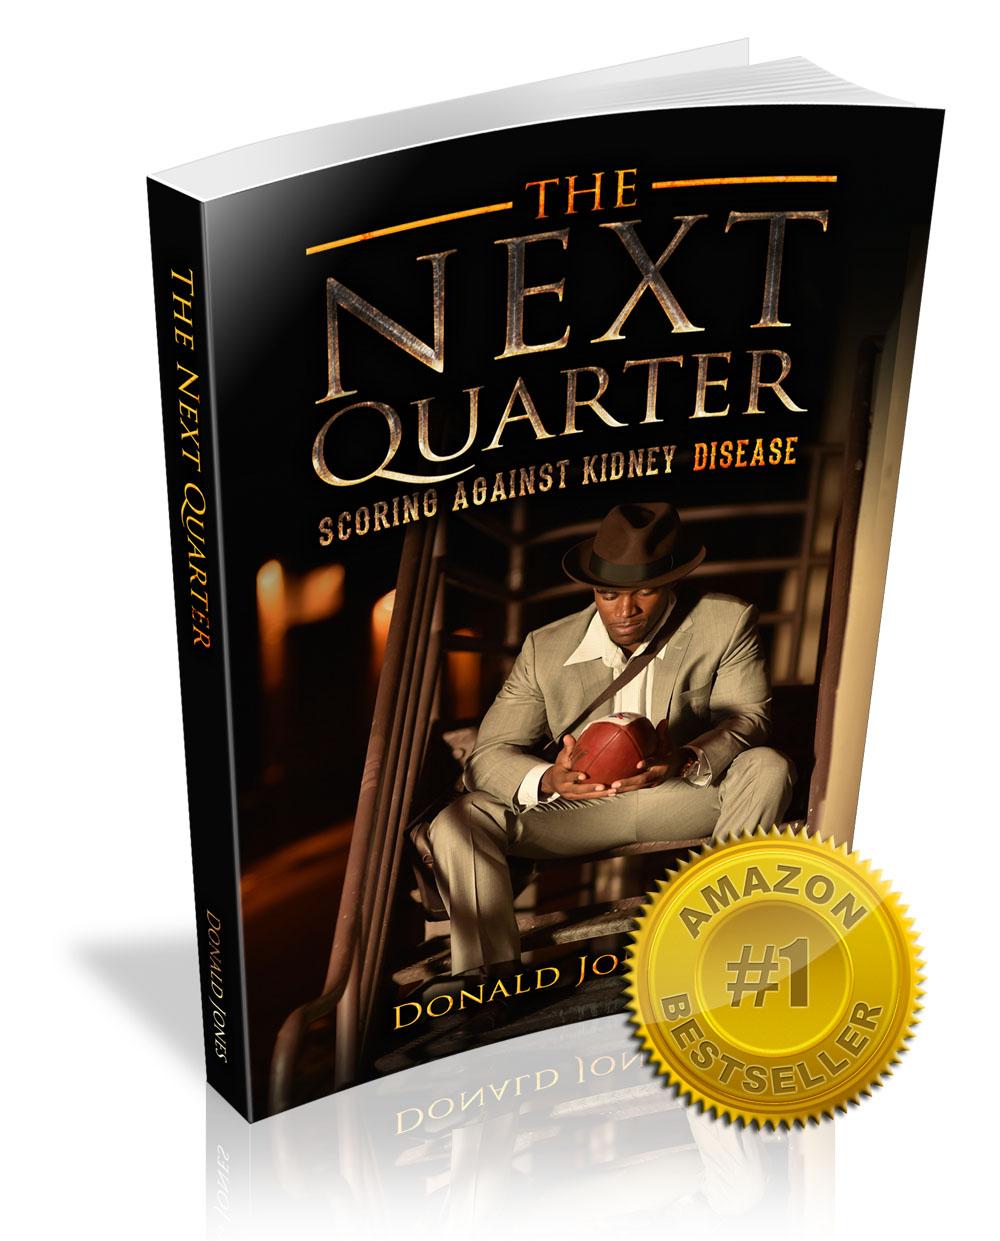 b18122fbbeda049caa9f_TheNextQuarter-Bestseller3D__2_.jpg